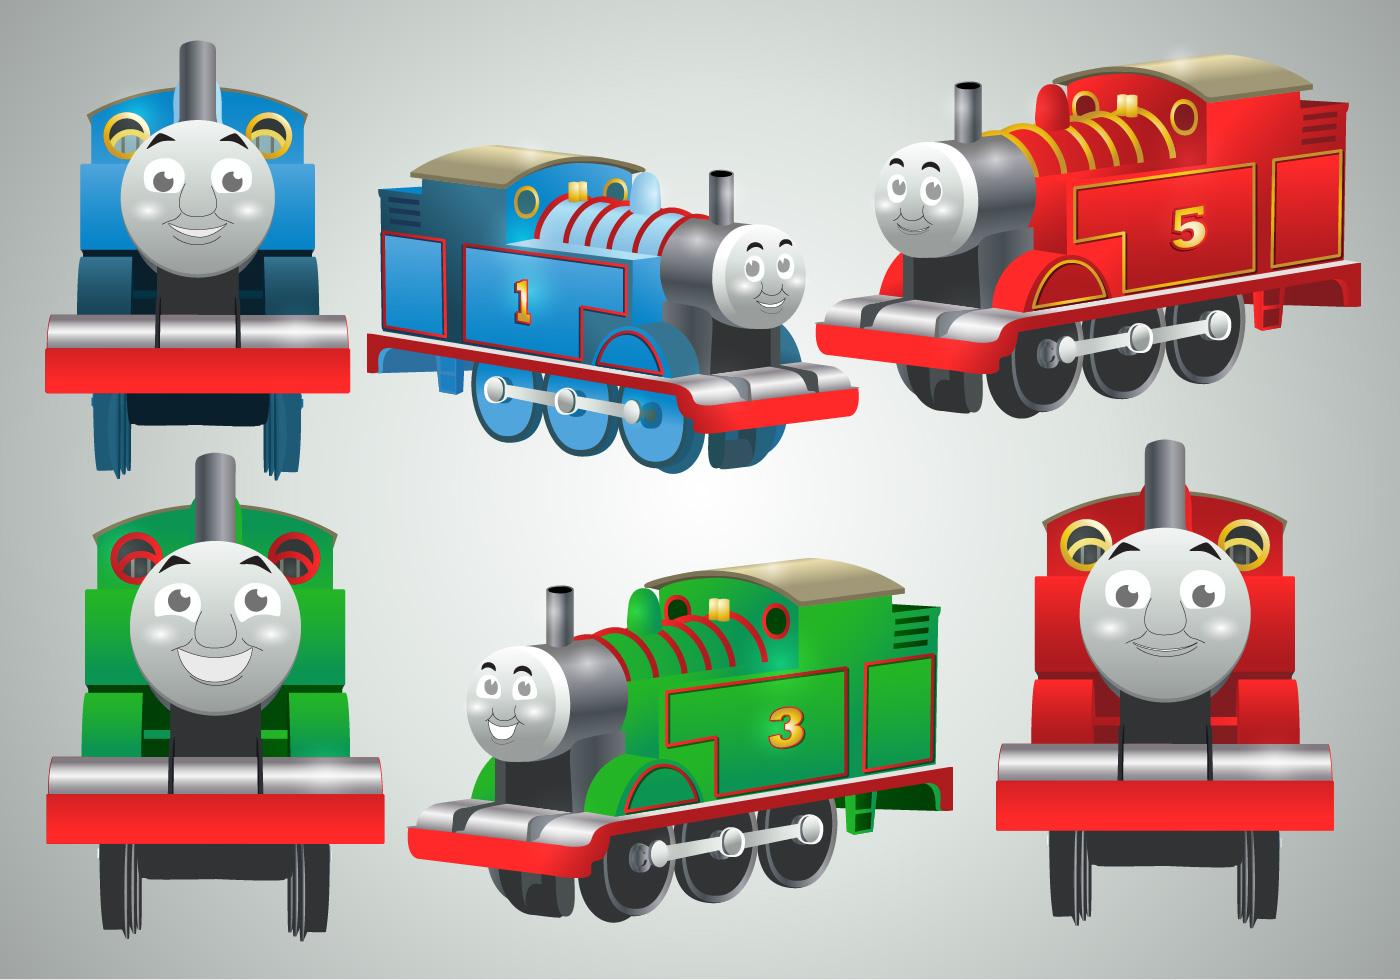 Thomas The Train Vectors - Download Free Vector Art, Stock Graphics ...